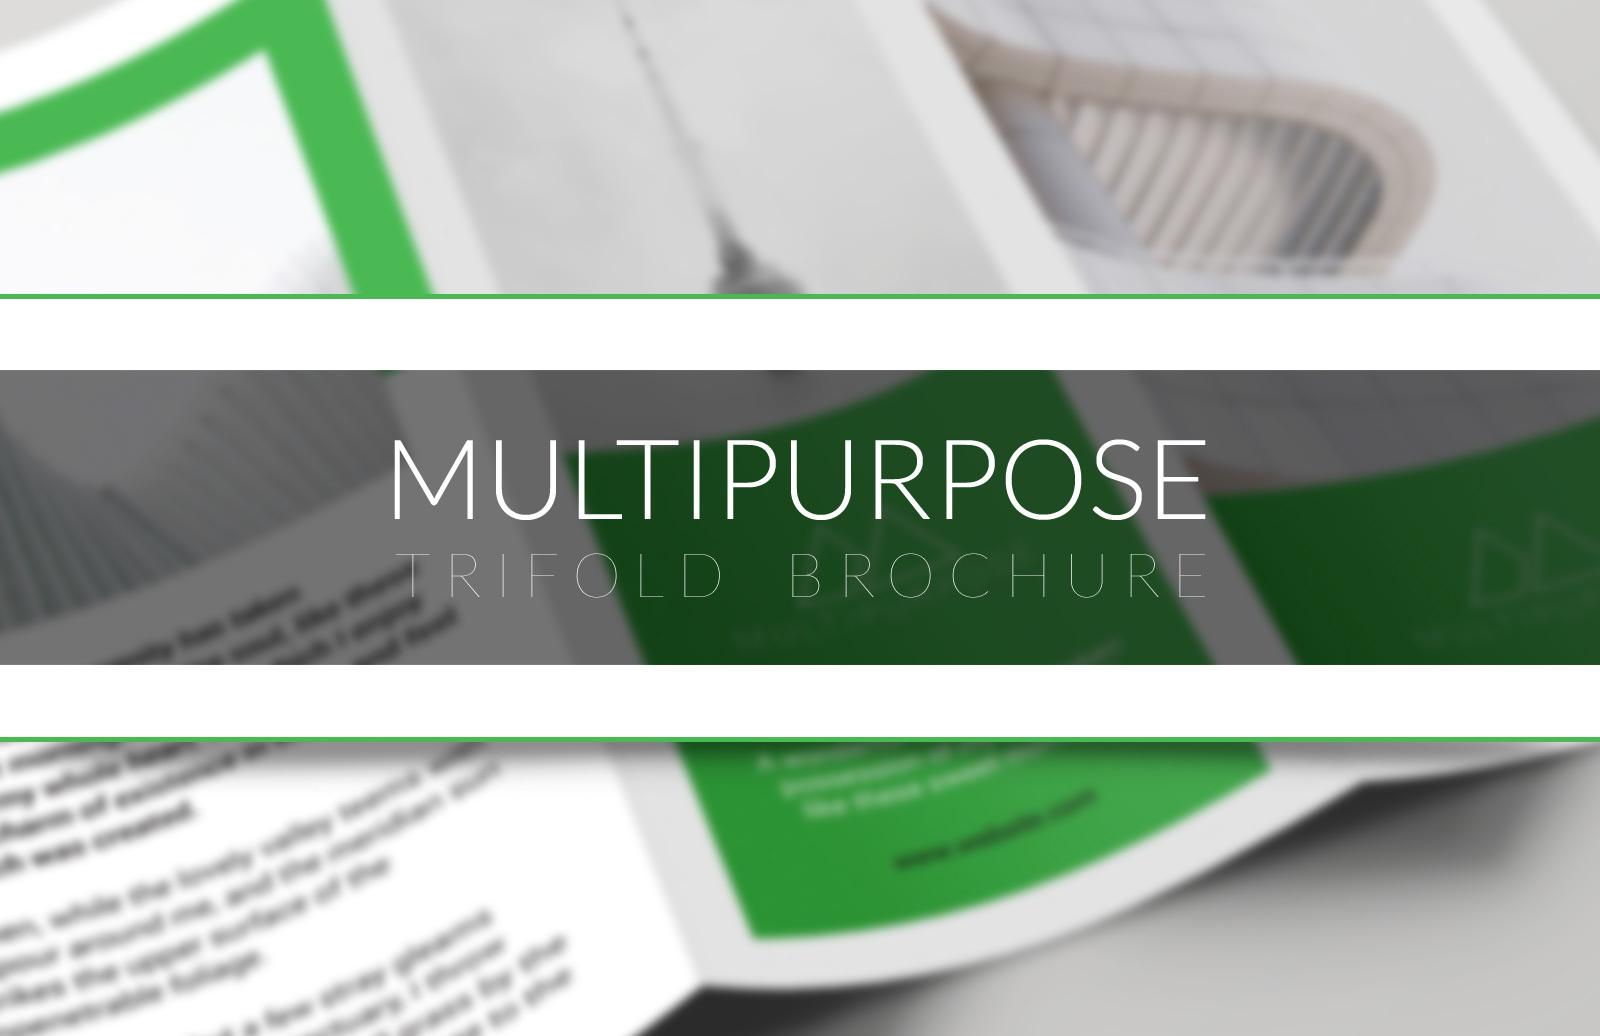 Multipurpose Trifold Brochure 1